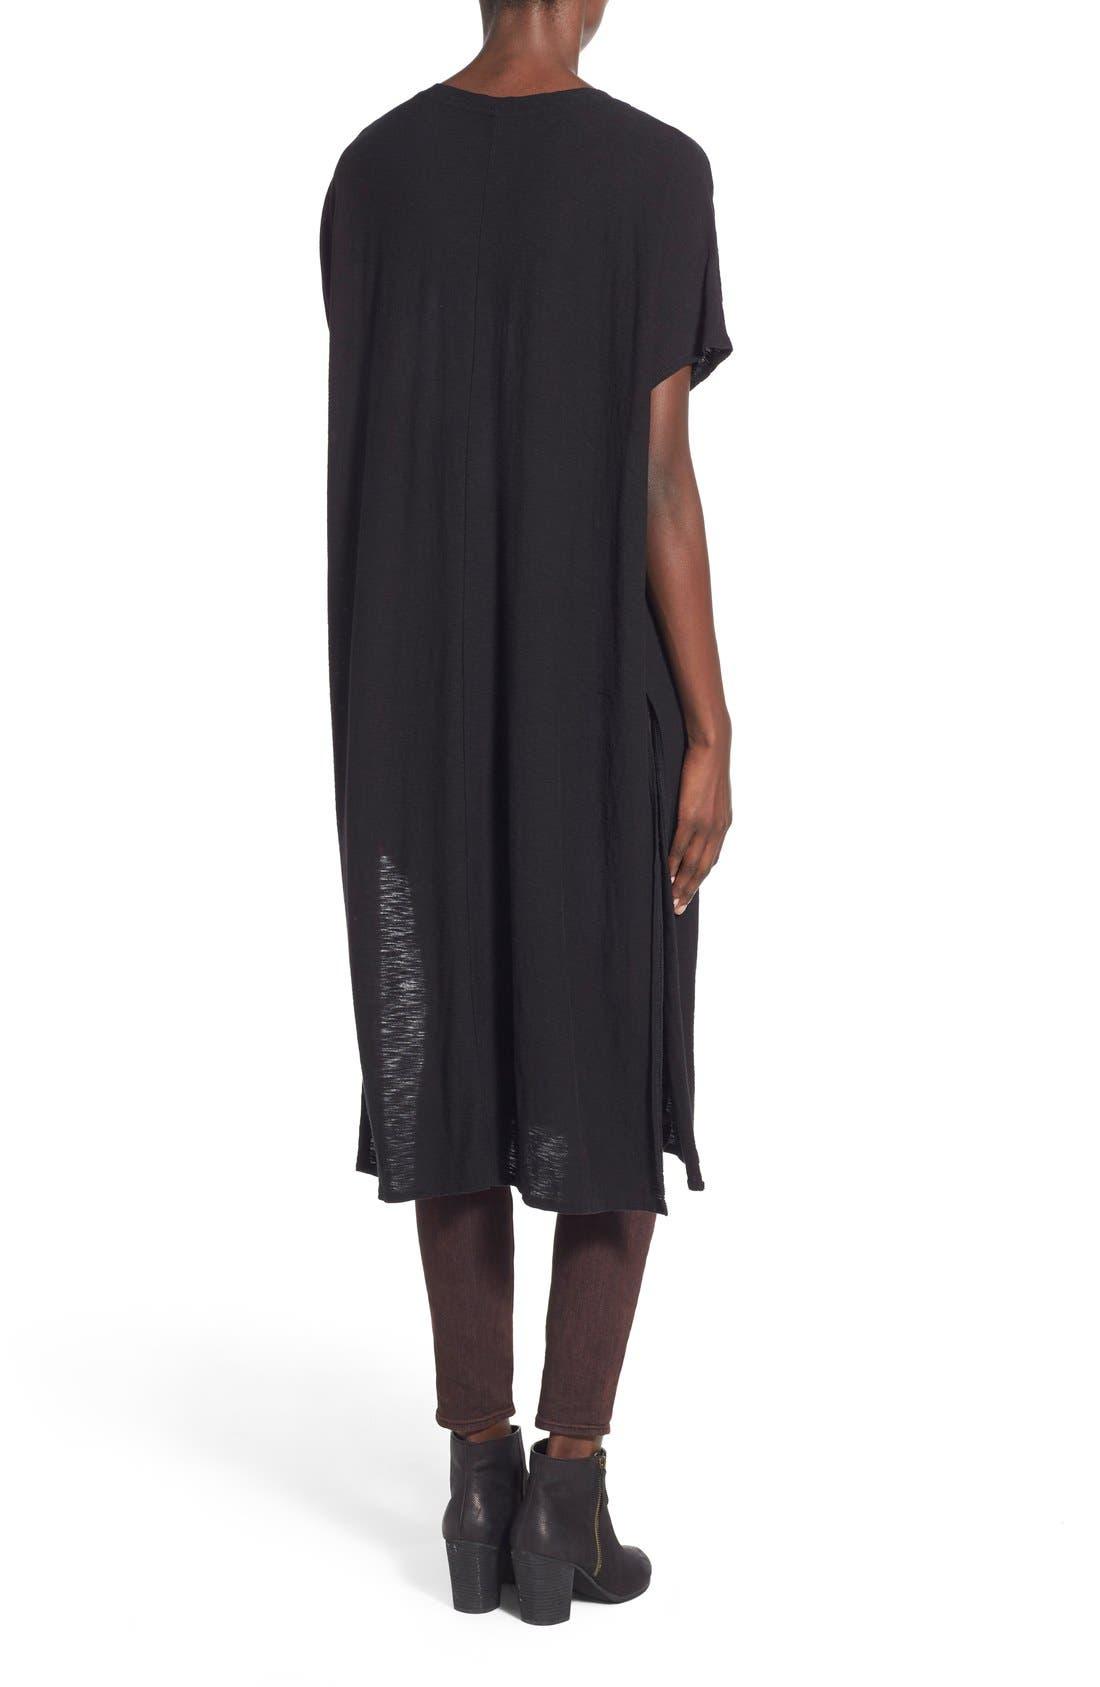 Alternate Image 2  - Michelle by Comune 'Hayward' V-Neck T-Shirt Dress